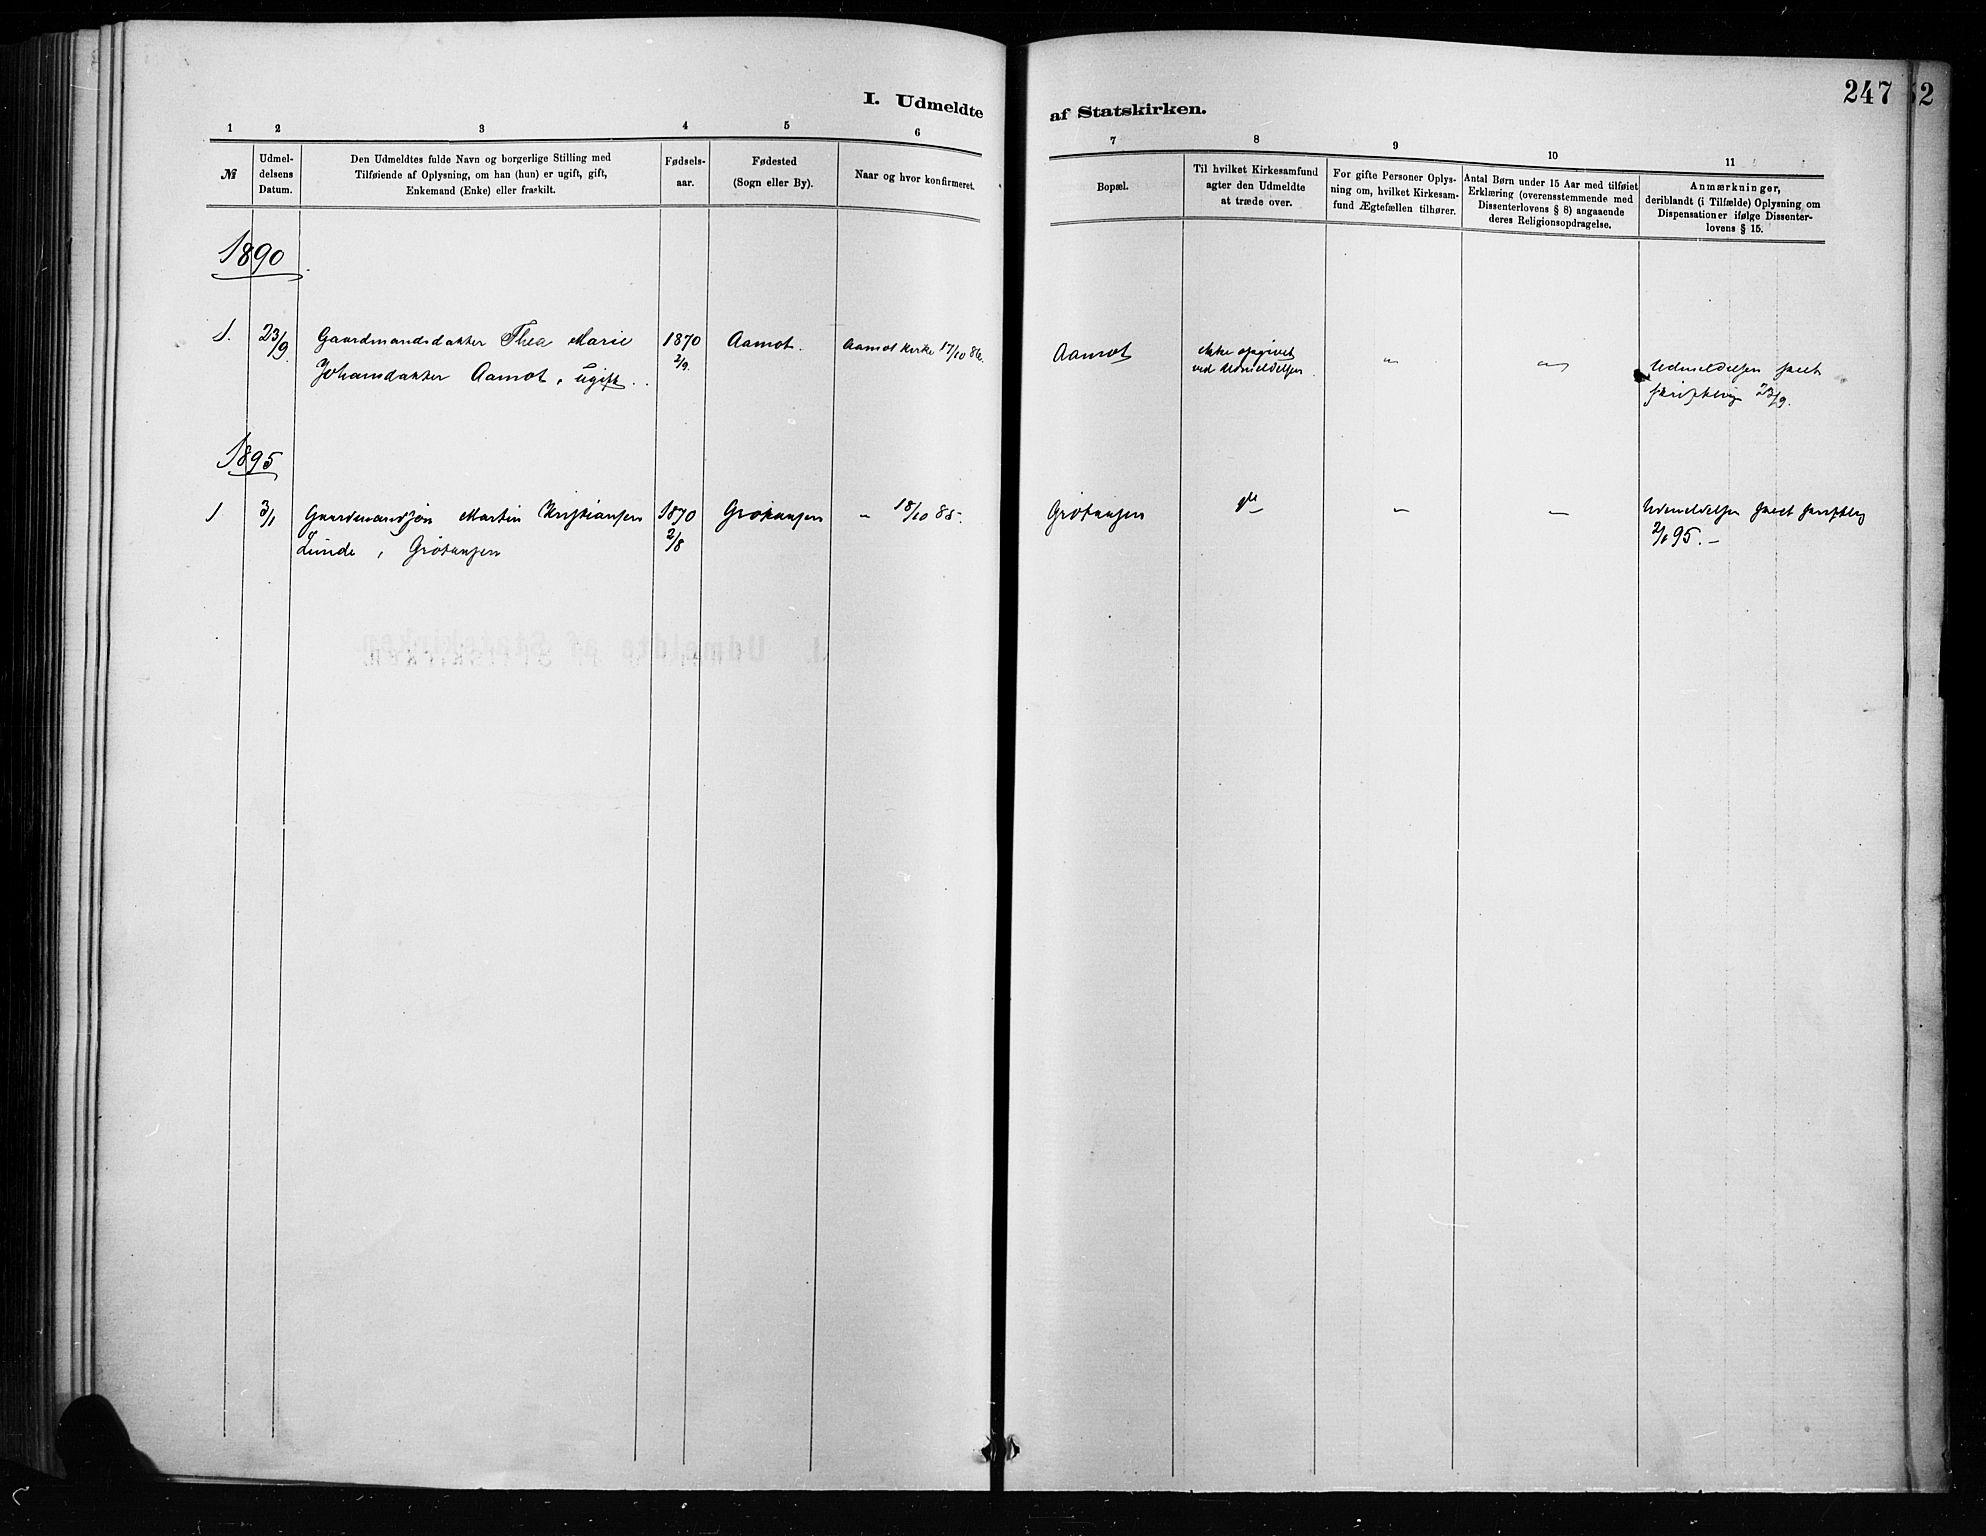 SAH, Nordre Land prestekontor, Ministerialbok nr. 4, 1882-1896, s. 247